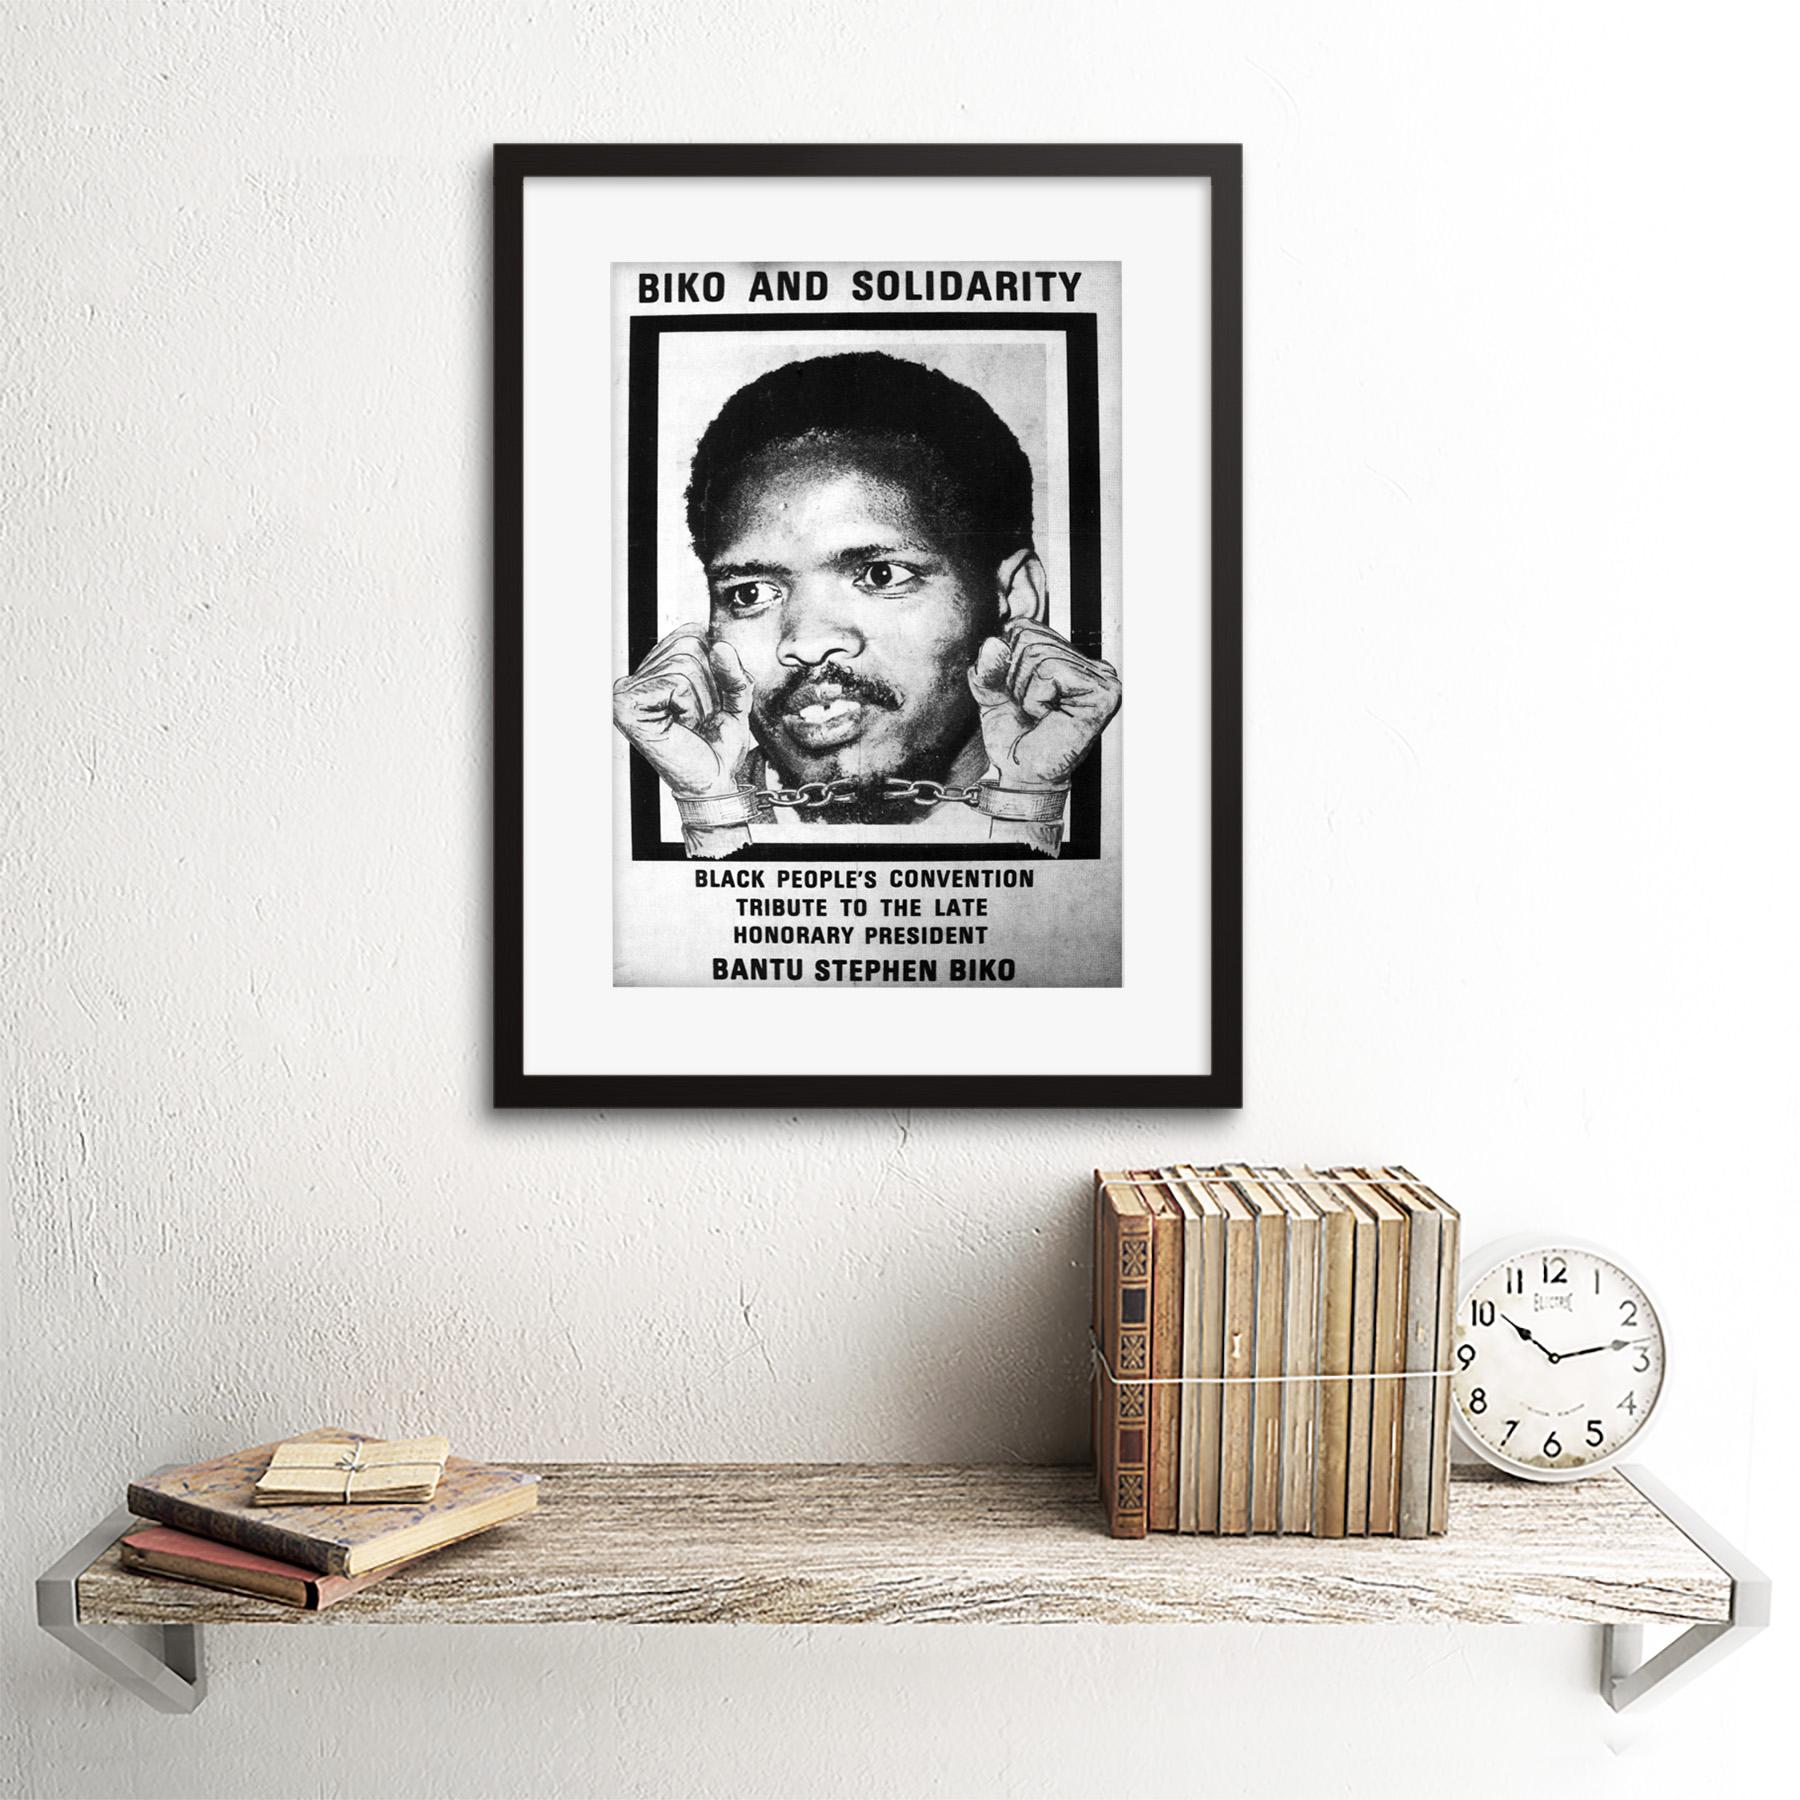 thumbnail 3 - Political Steve Biko Anc Apartheid South Africa Framed Wall Art Print